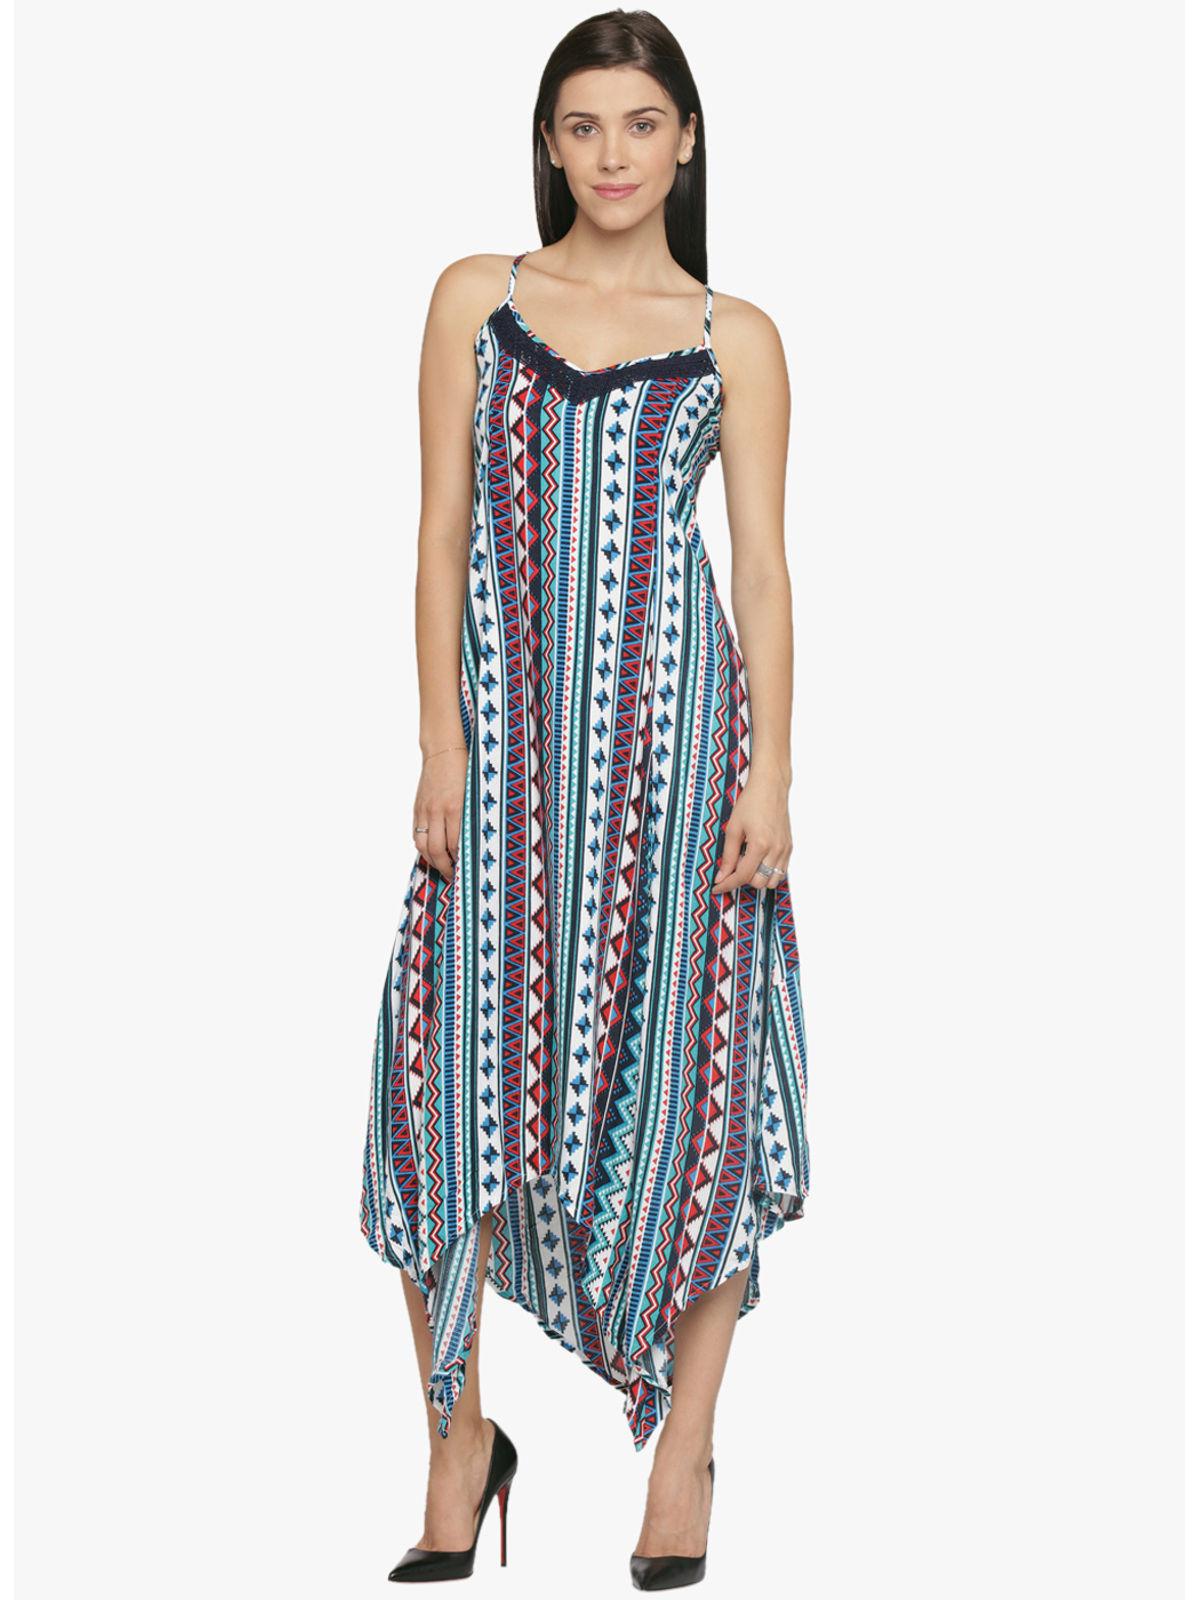 HENRYETTA BEACH DRESS